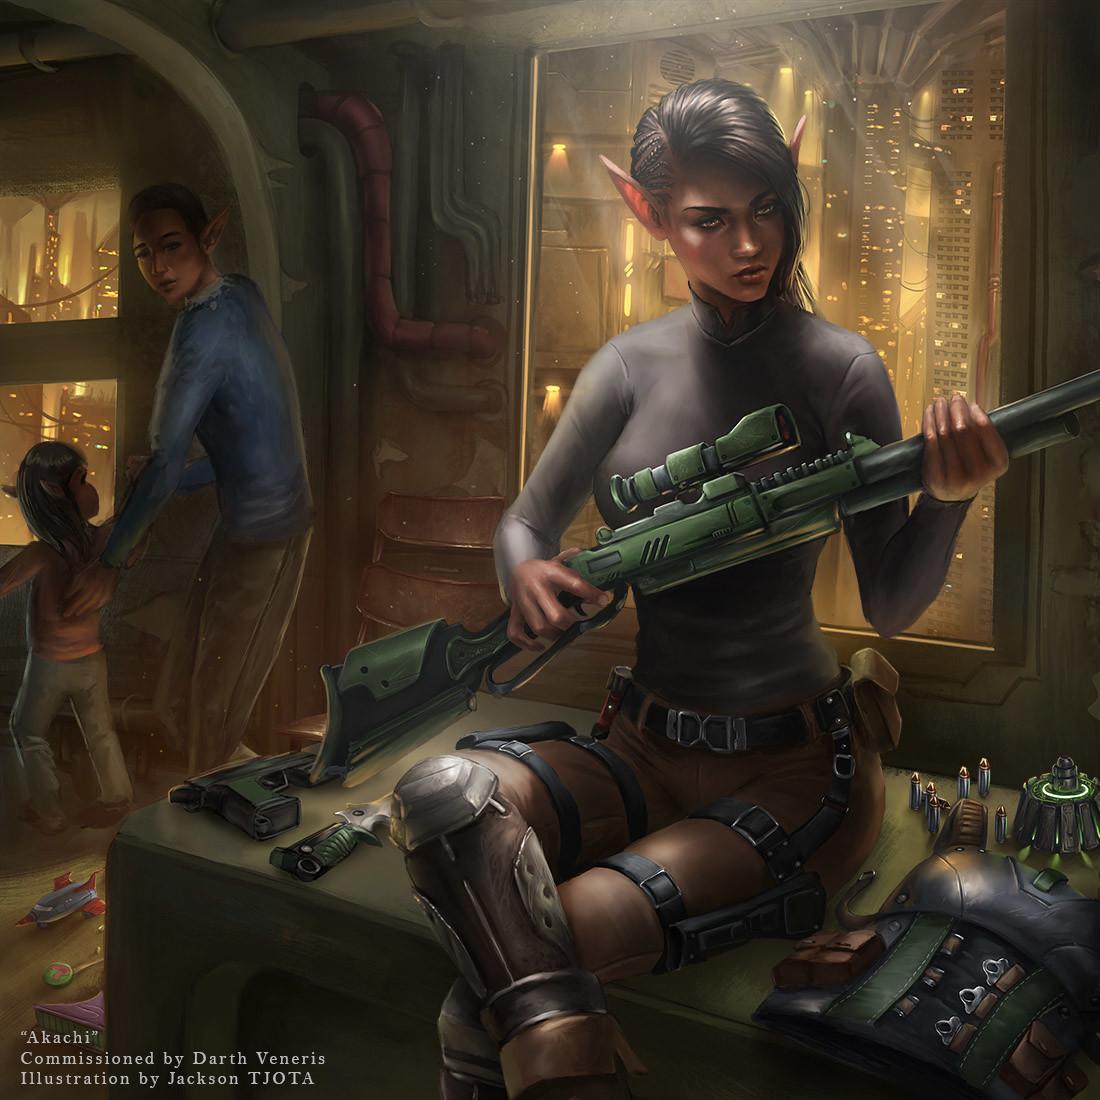 Futuristic Soldier Girl Wallpaper Artstation Commission Akachi Jackson Tjota